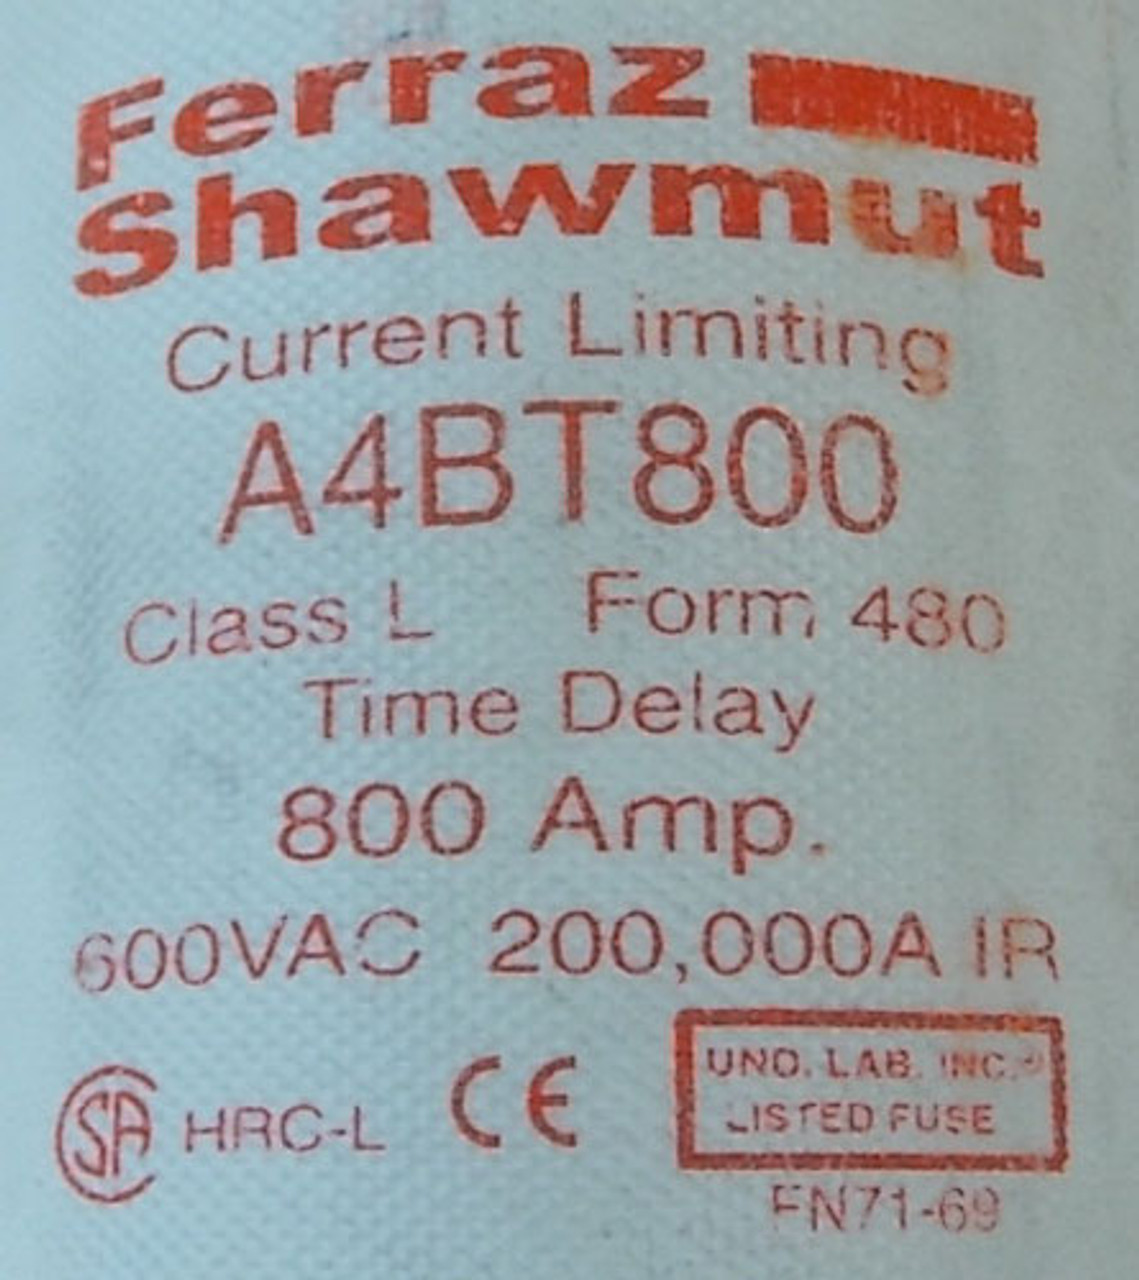 Ferraz Shawmut A4BT800 800A 600VAC Class L Time Delay Fuse - Used